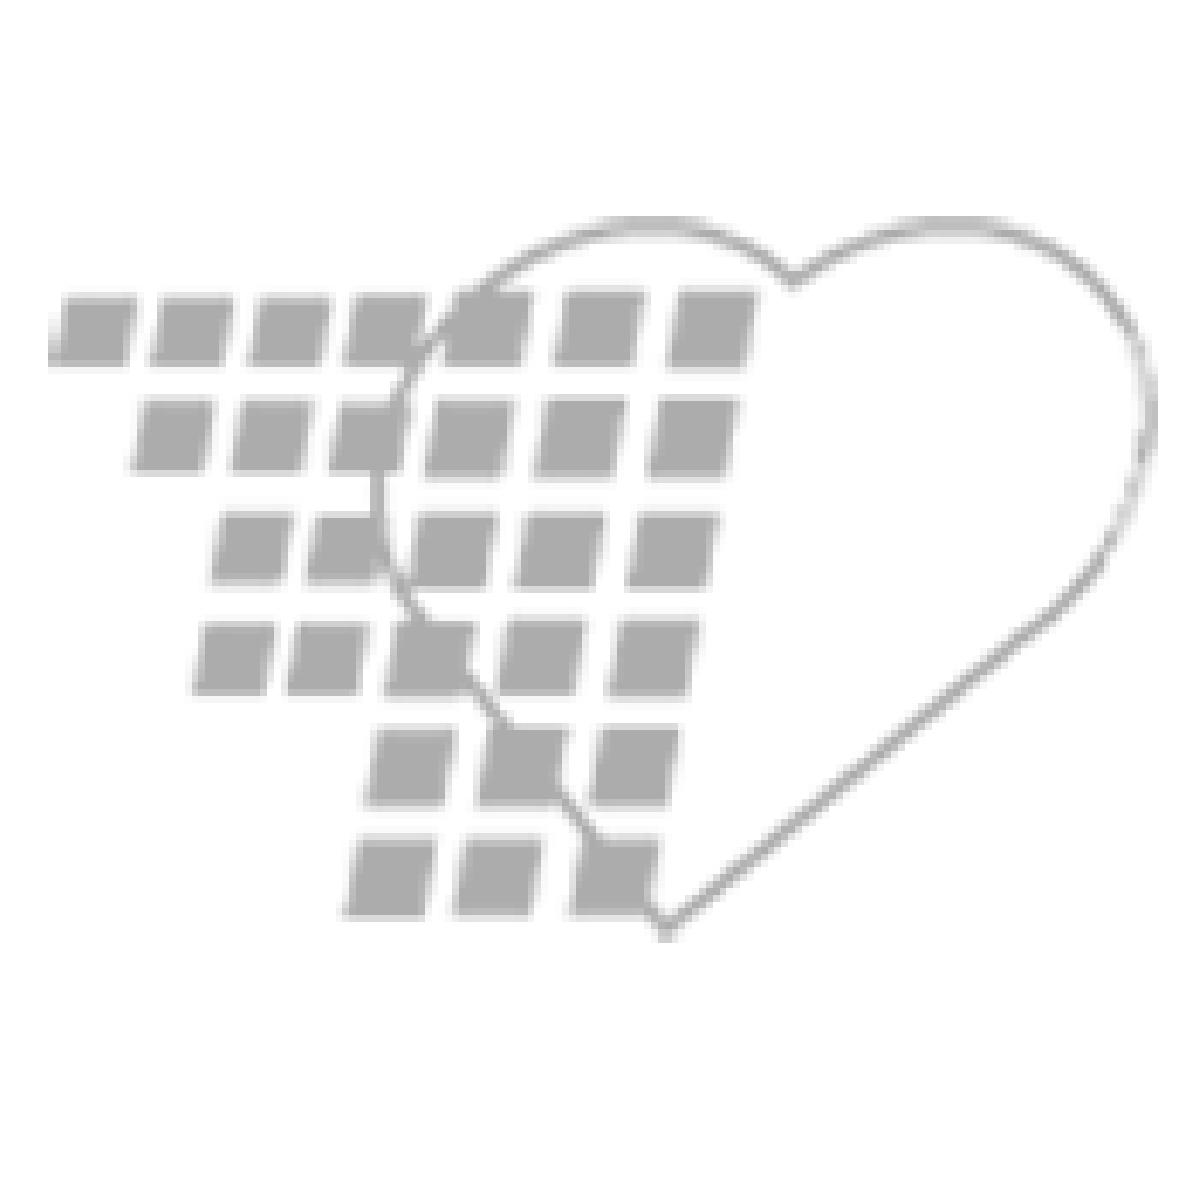 10-81-0903 Nasco Life/form® Retracted Ostomy Care Training Model